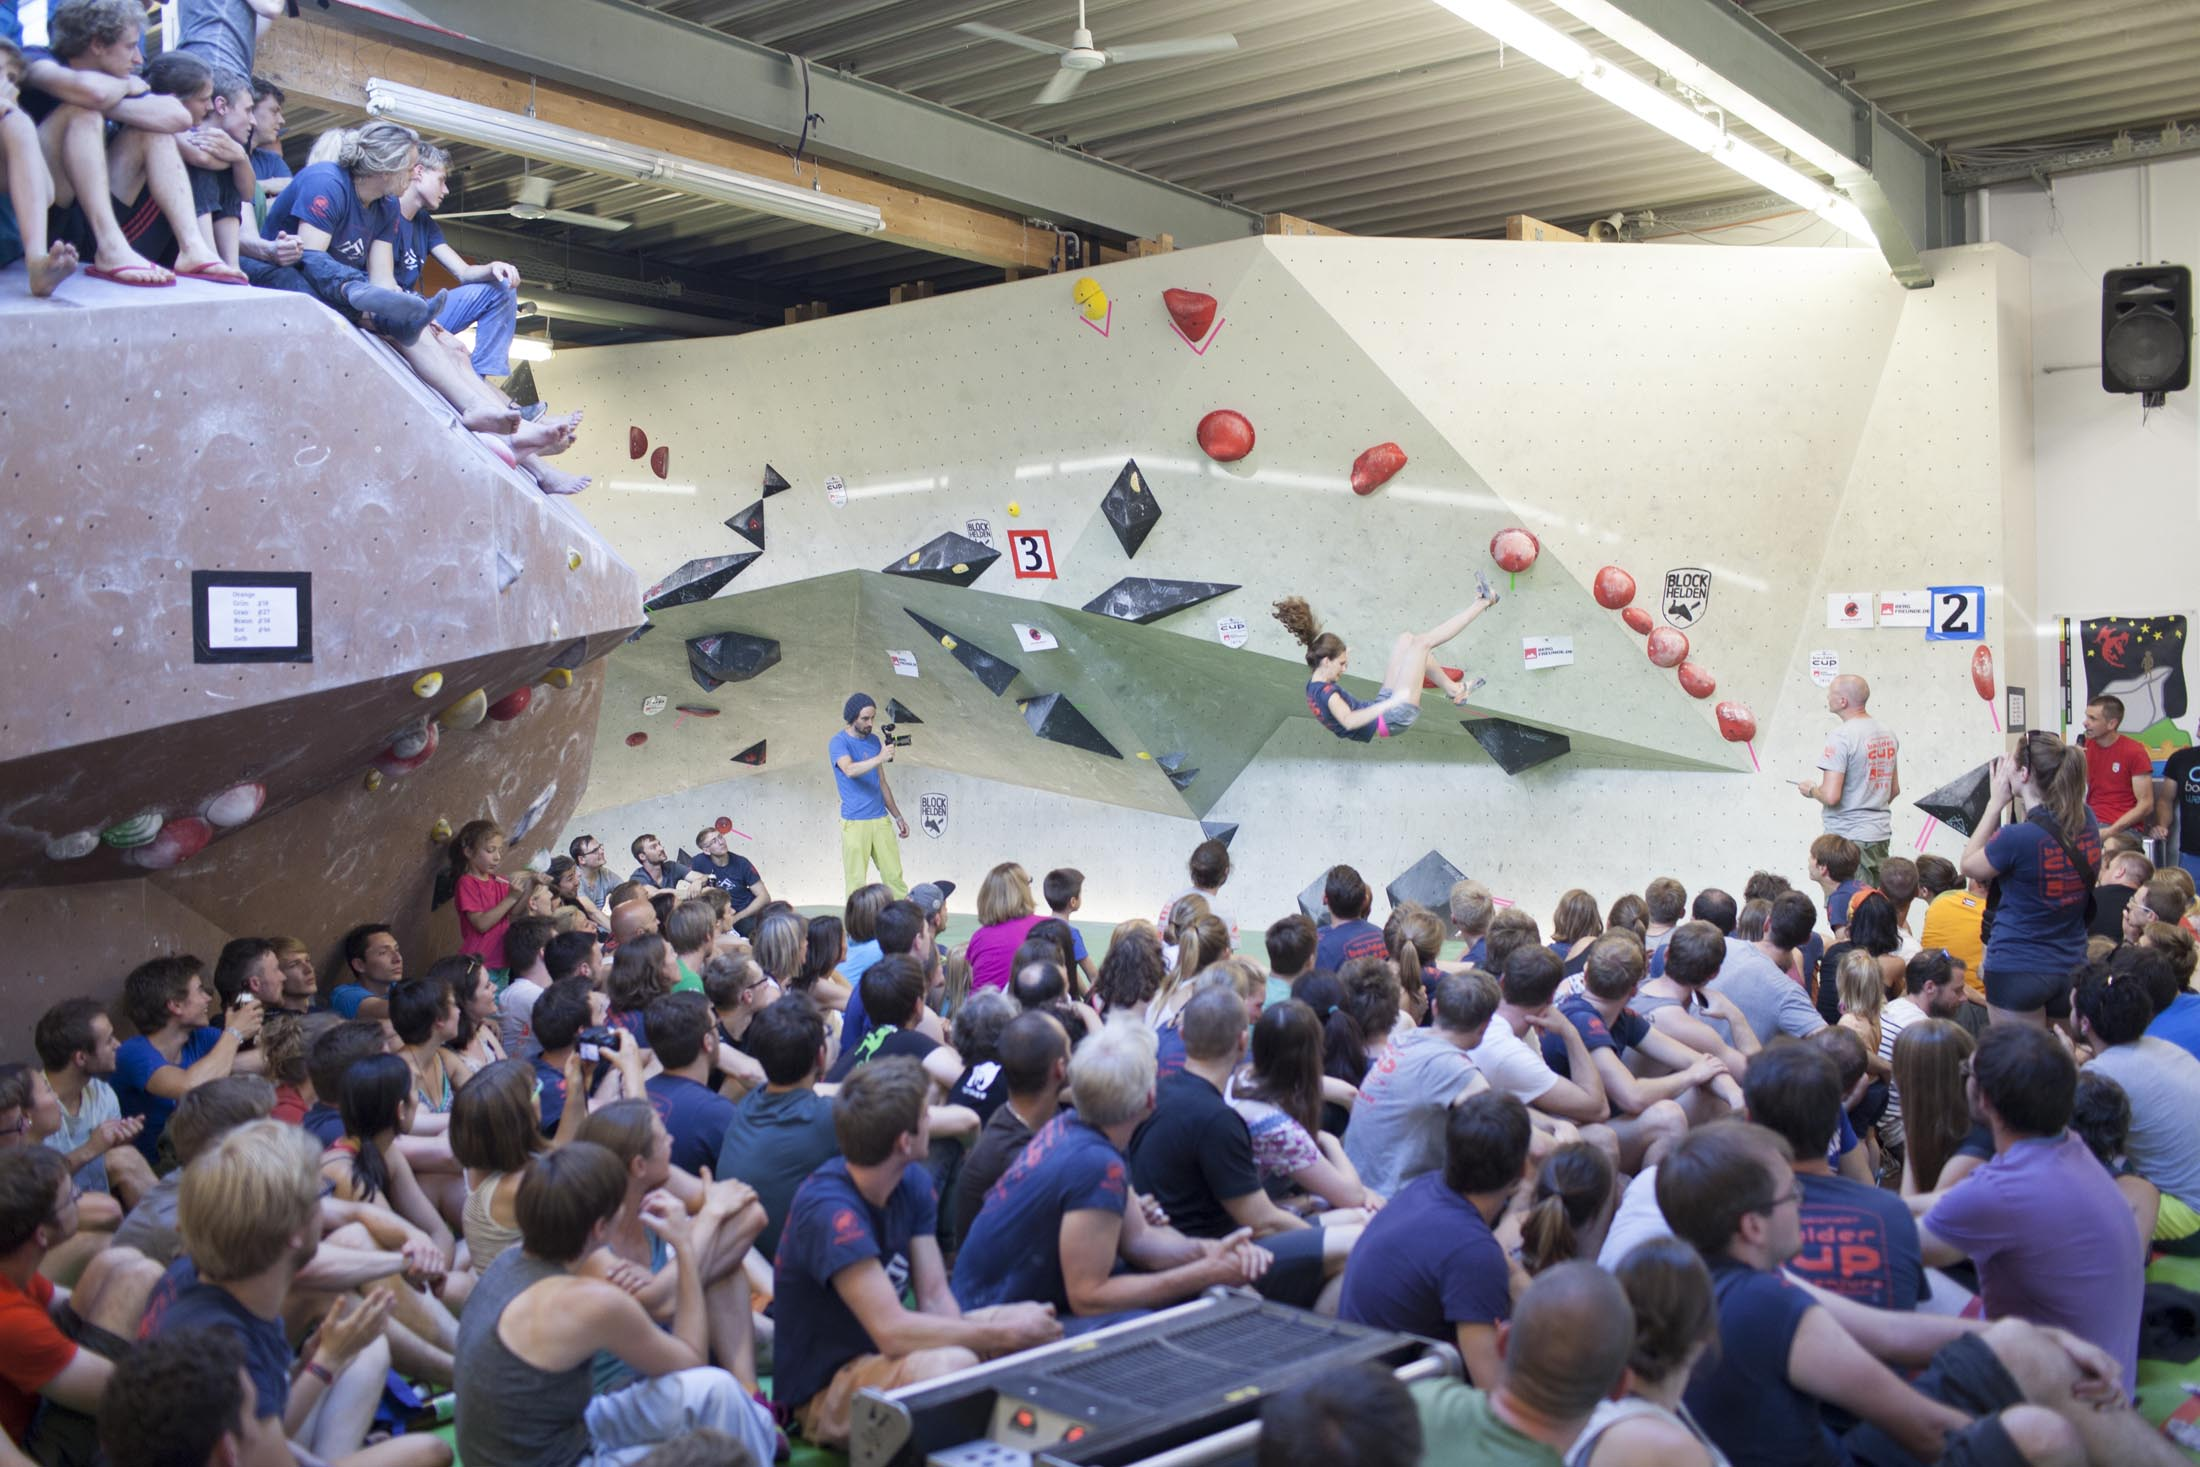 Finale, internationaler bouldercup Frankenjura 2016, BLOCKHELDEN Erlangen, Mammut, Bergfreunde.de, Boulderwettkampf07092016585